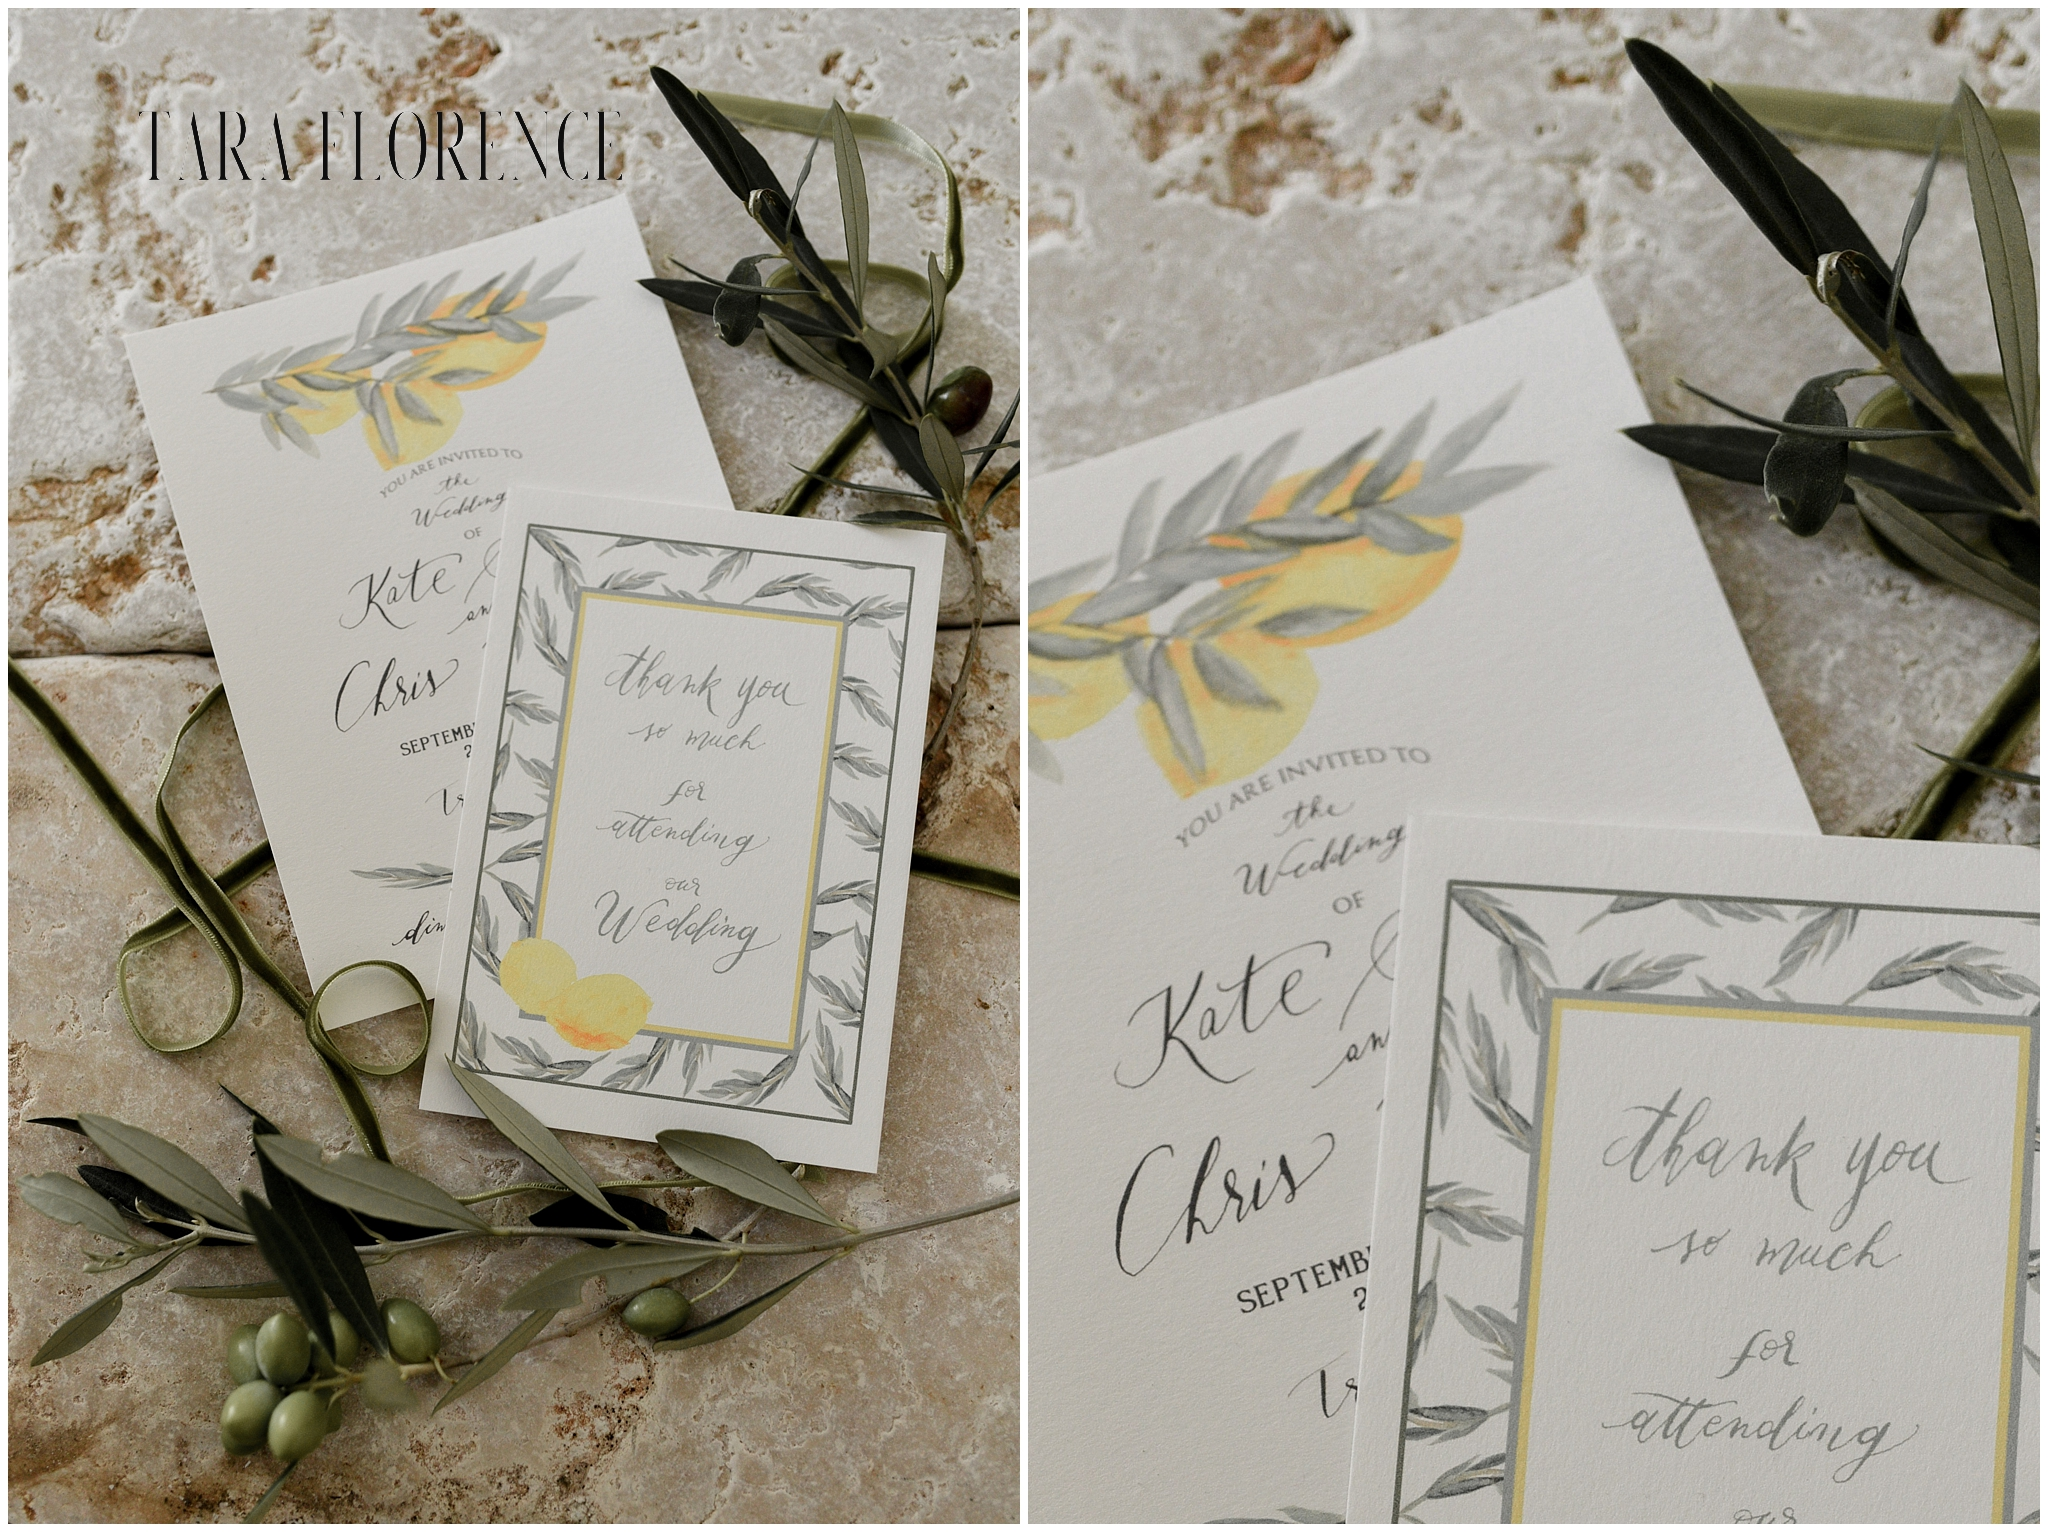 Puglia-Tara-Florence-Bridal-Editorial-102_WEB.jpg